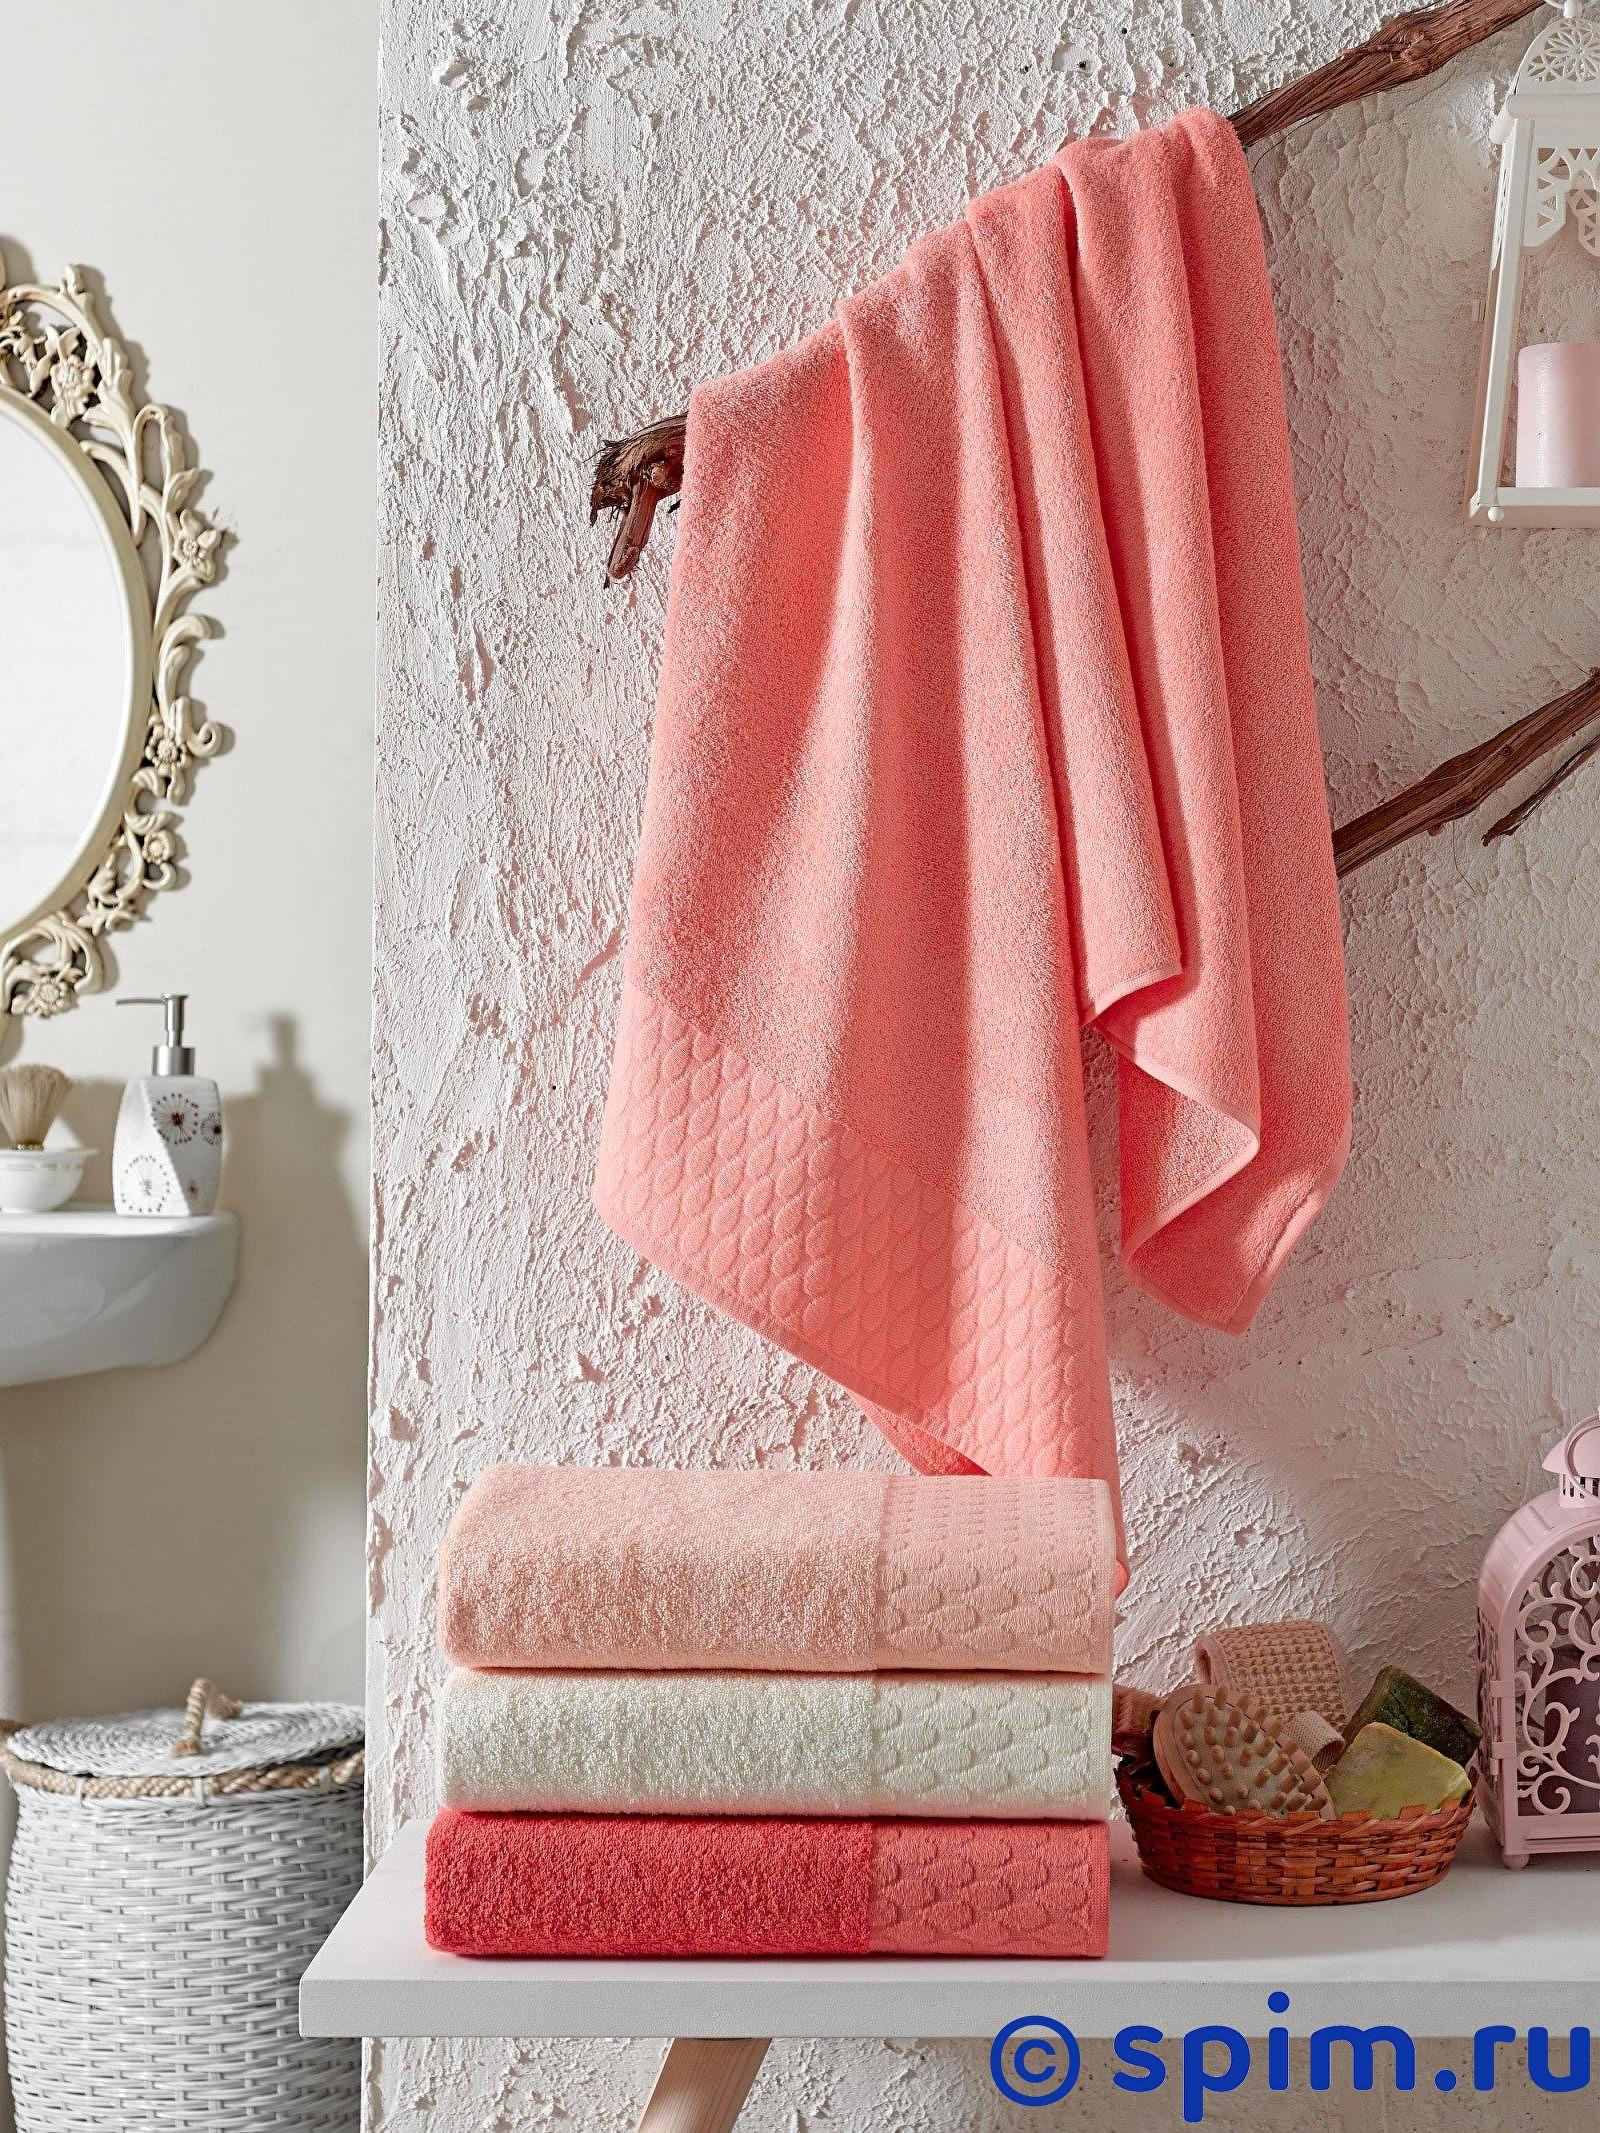 Набор из 4-х полотенец Do&co Cristie 50х90 см полотенца do n co полотенце lady цвет мятный набор